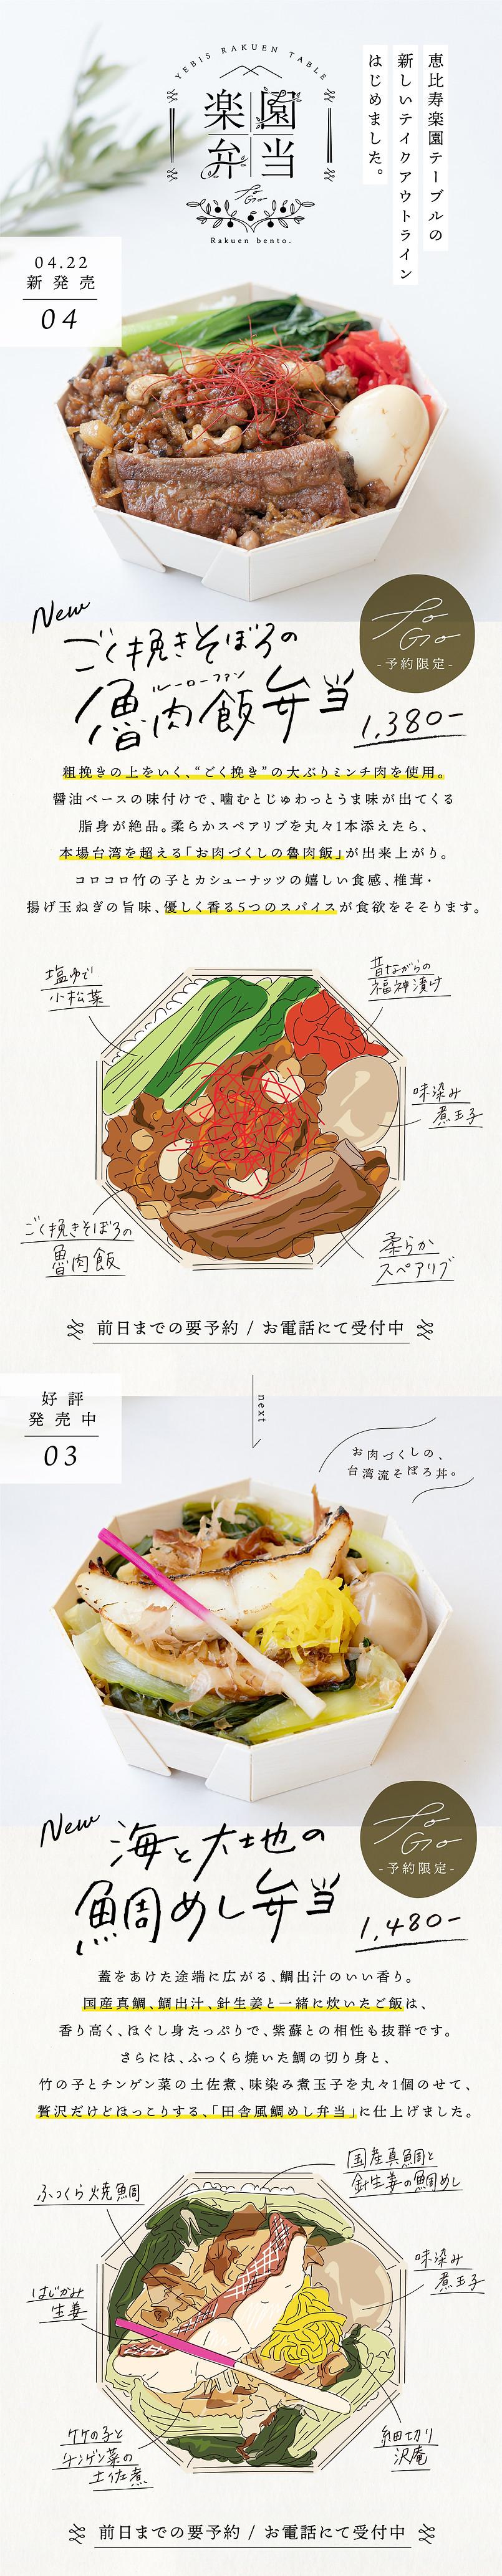 HP_ルーロー-03.jpg